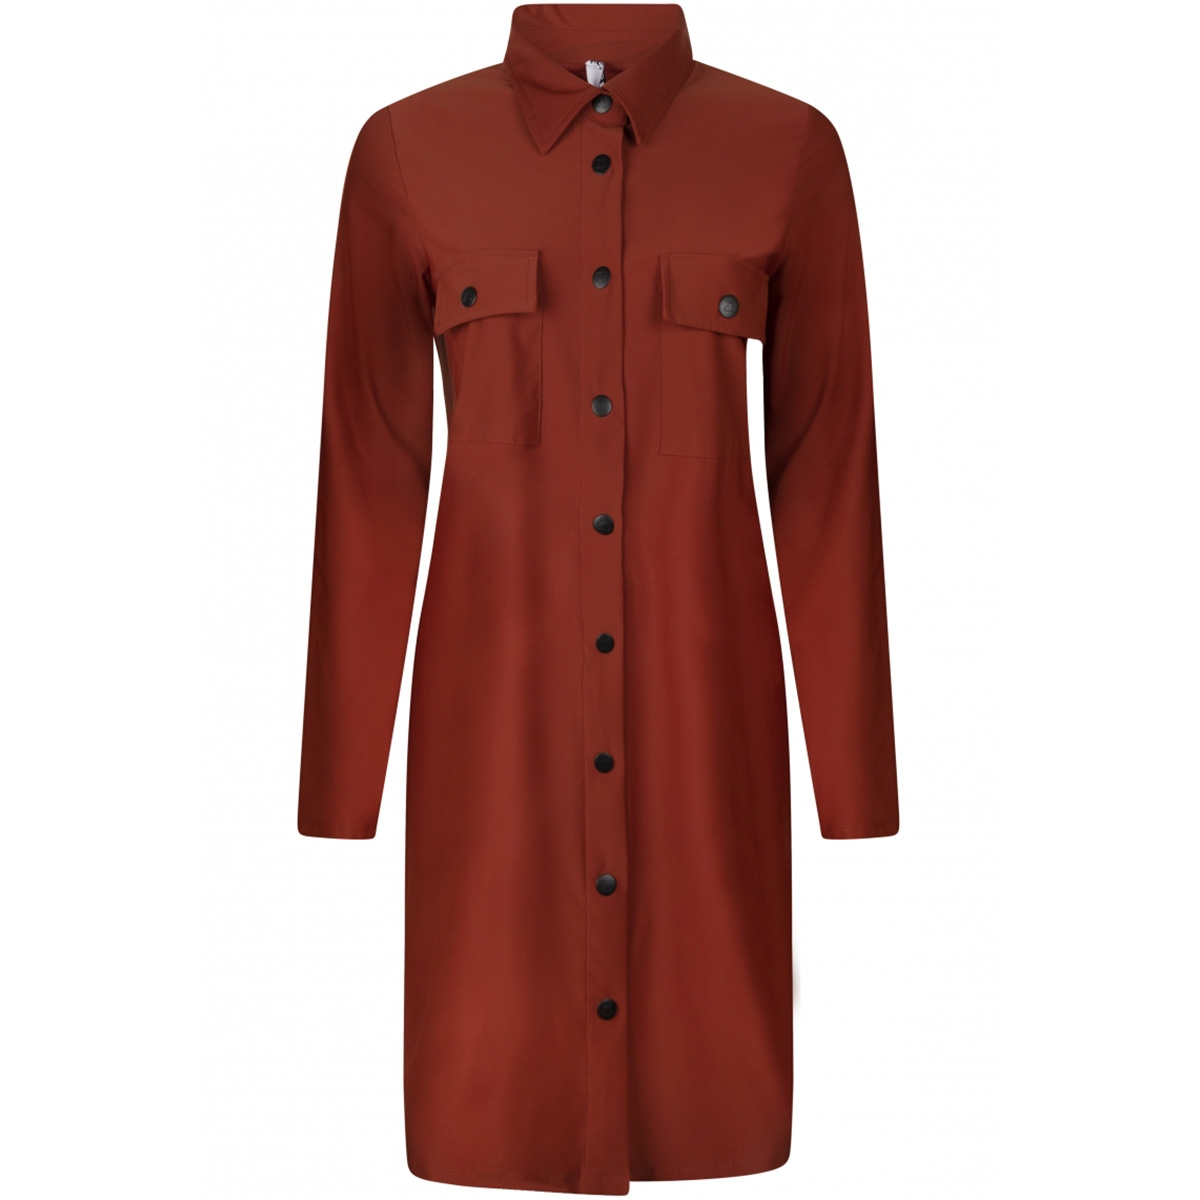 195 terry winter  long blouse zoso jurk winter brique